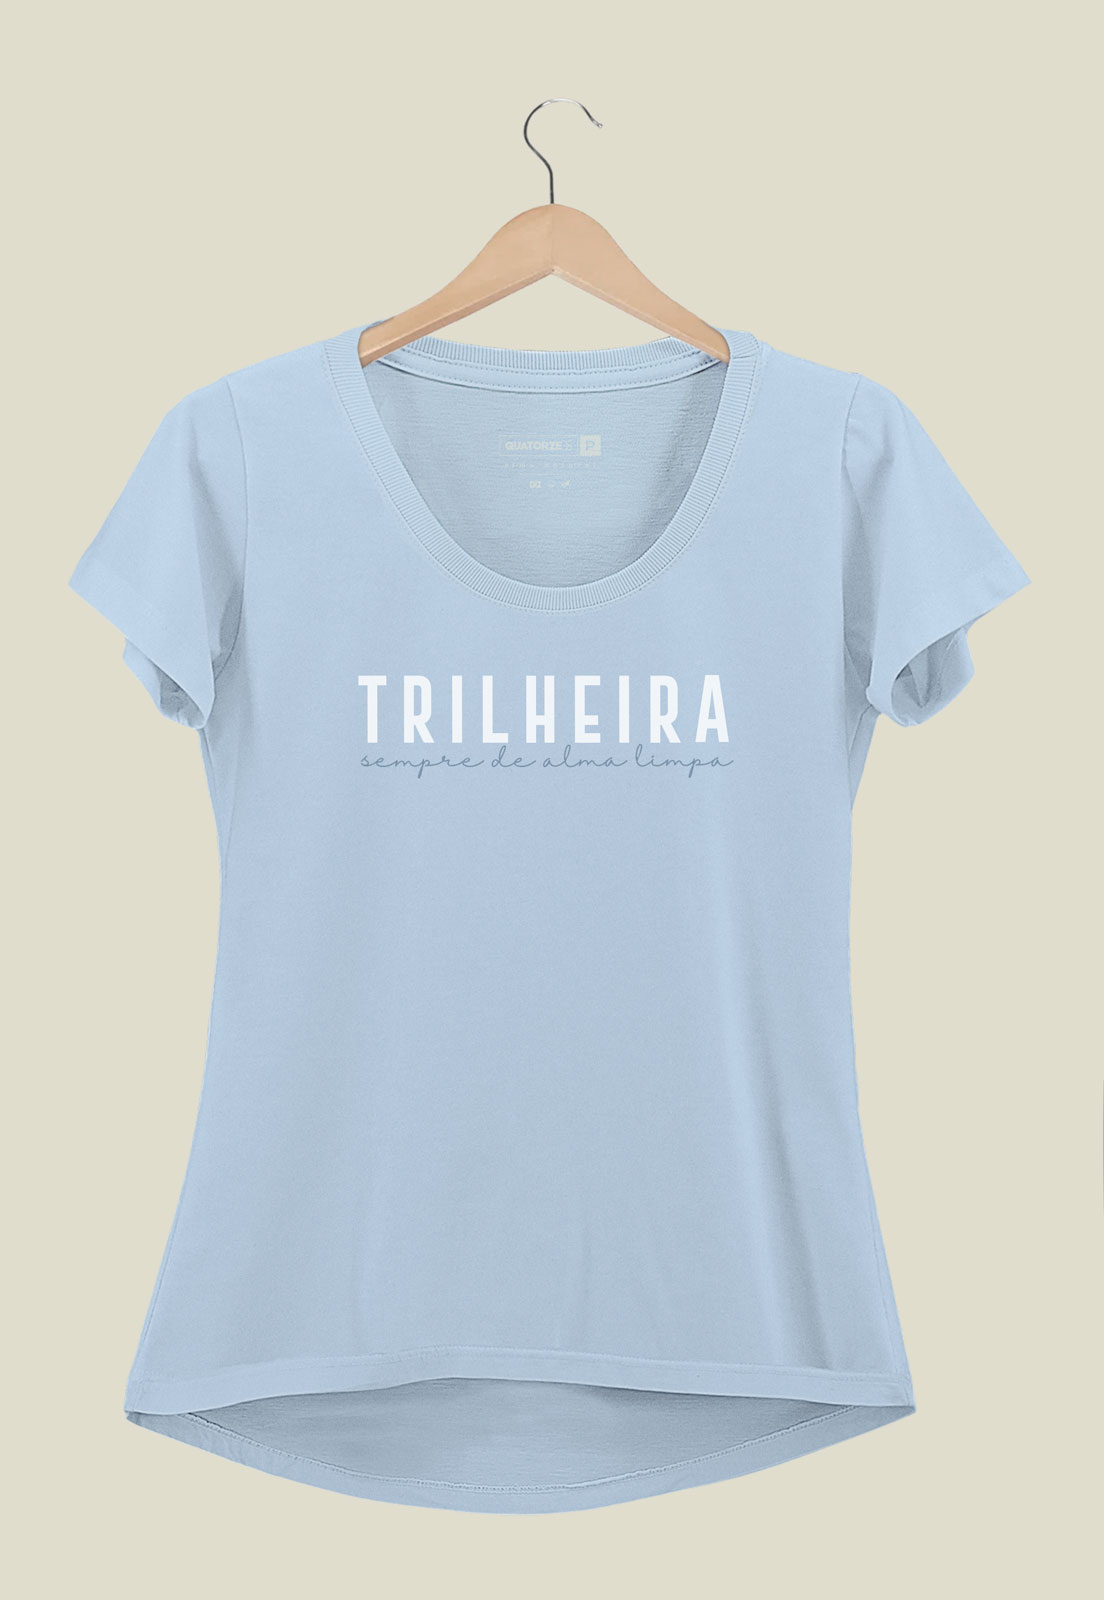 Camiseta Feminina Trilheira Azul Claro Estonada